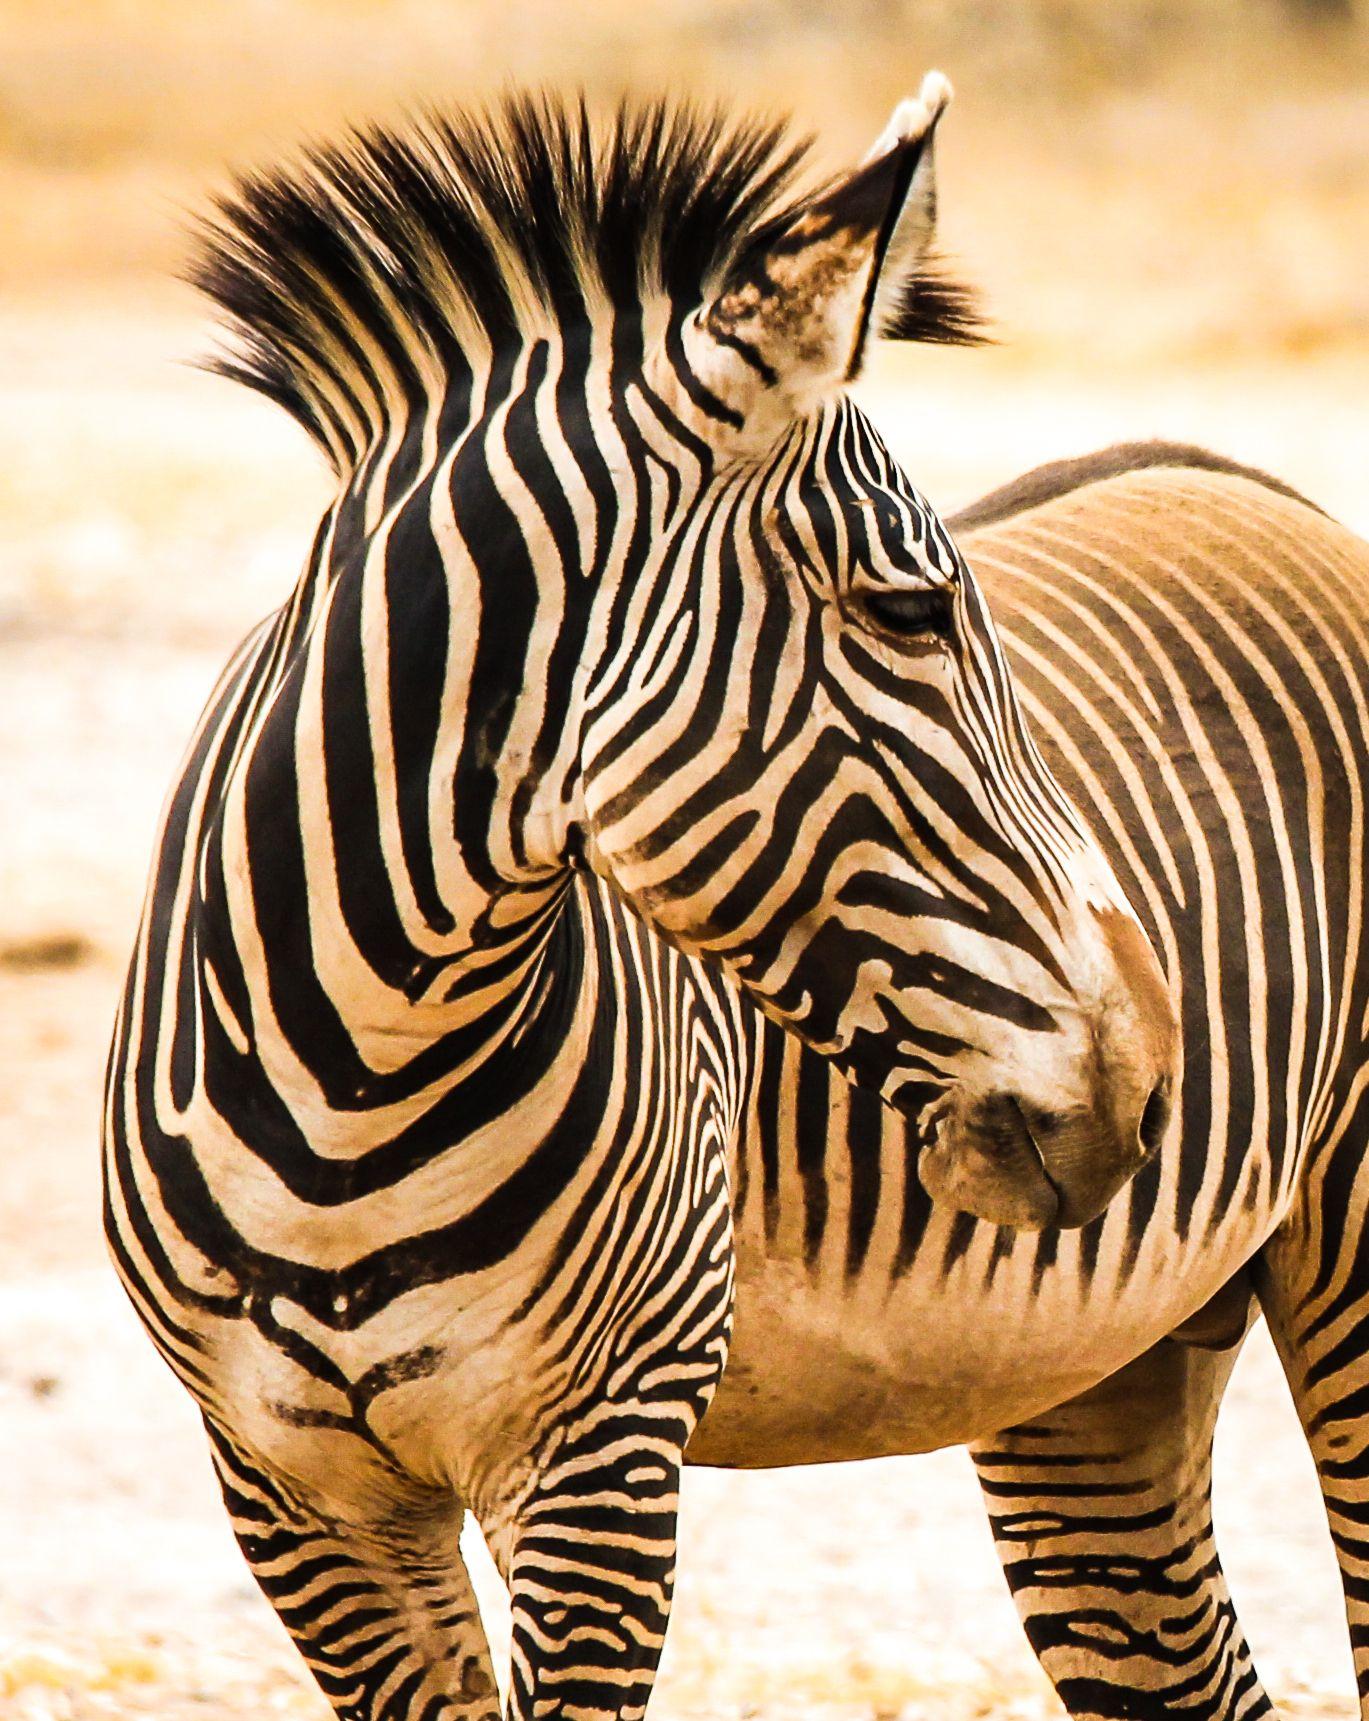 Kenya. The rare Grevy's Zebra in Samburu...so gorgeous!